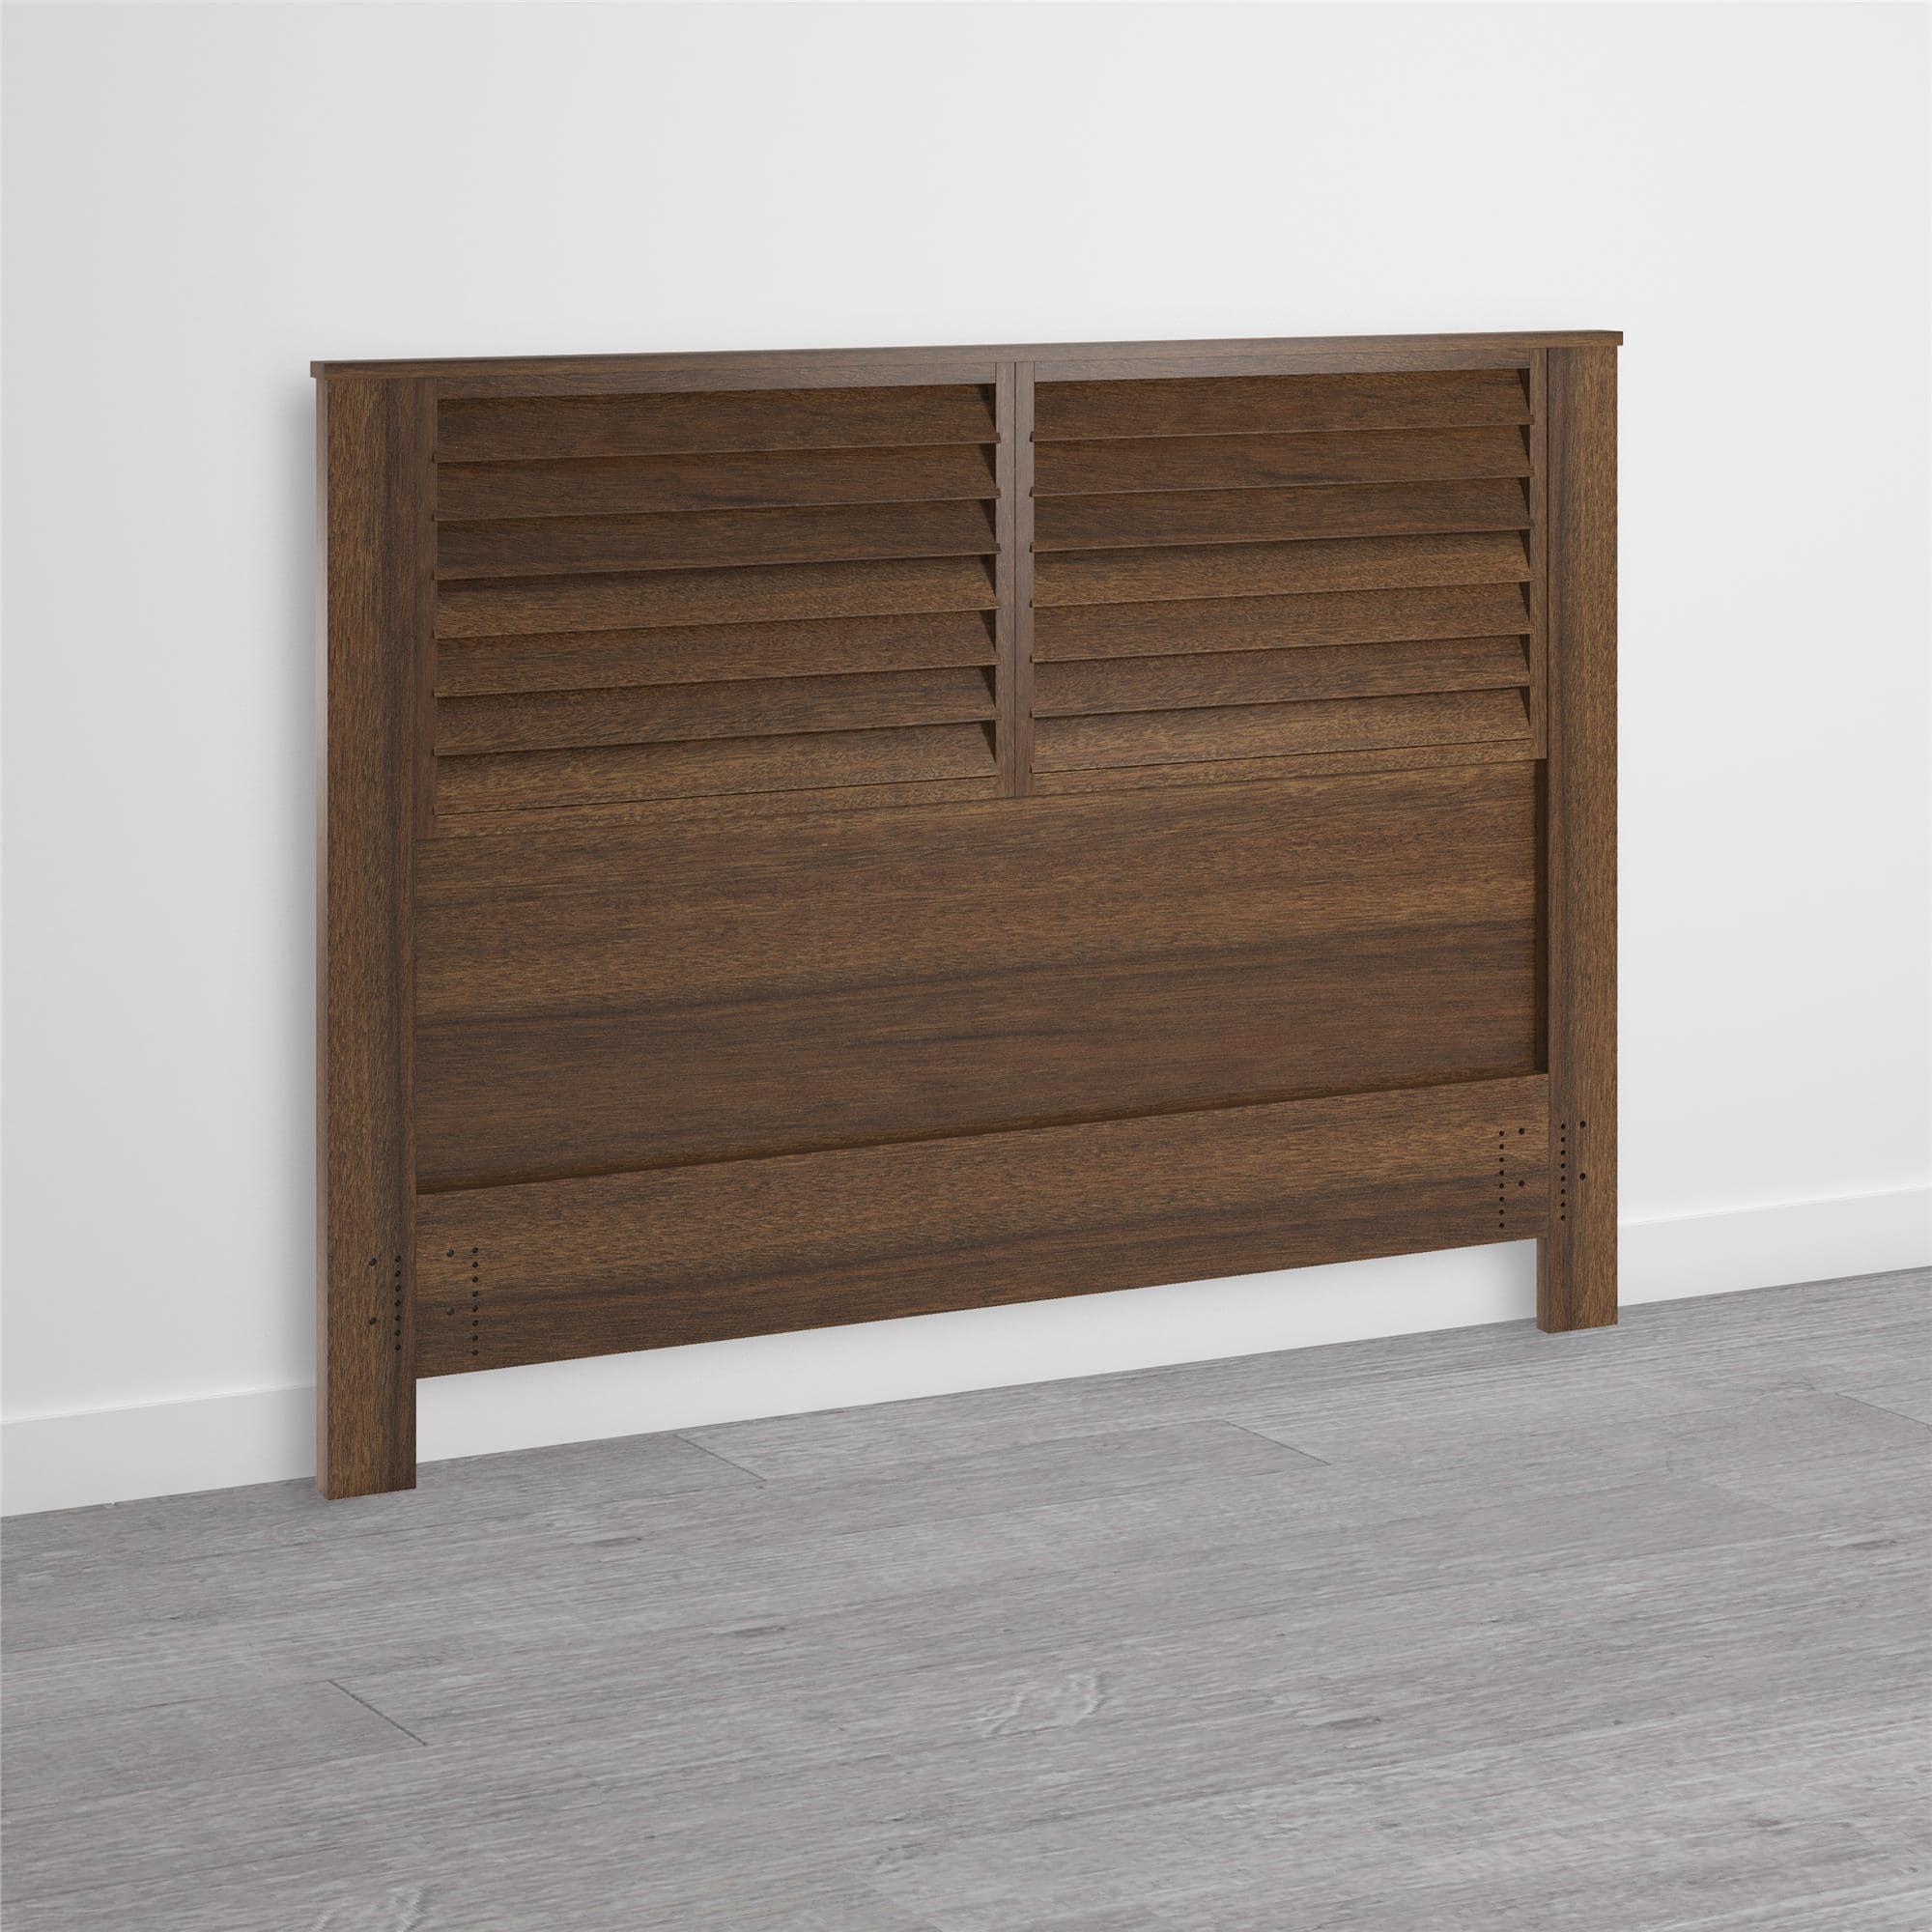 Great Deals On Furniture Online: Buy Headboards Online At Overstock